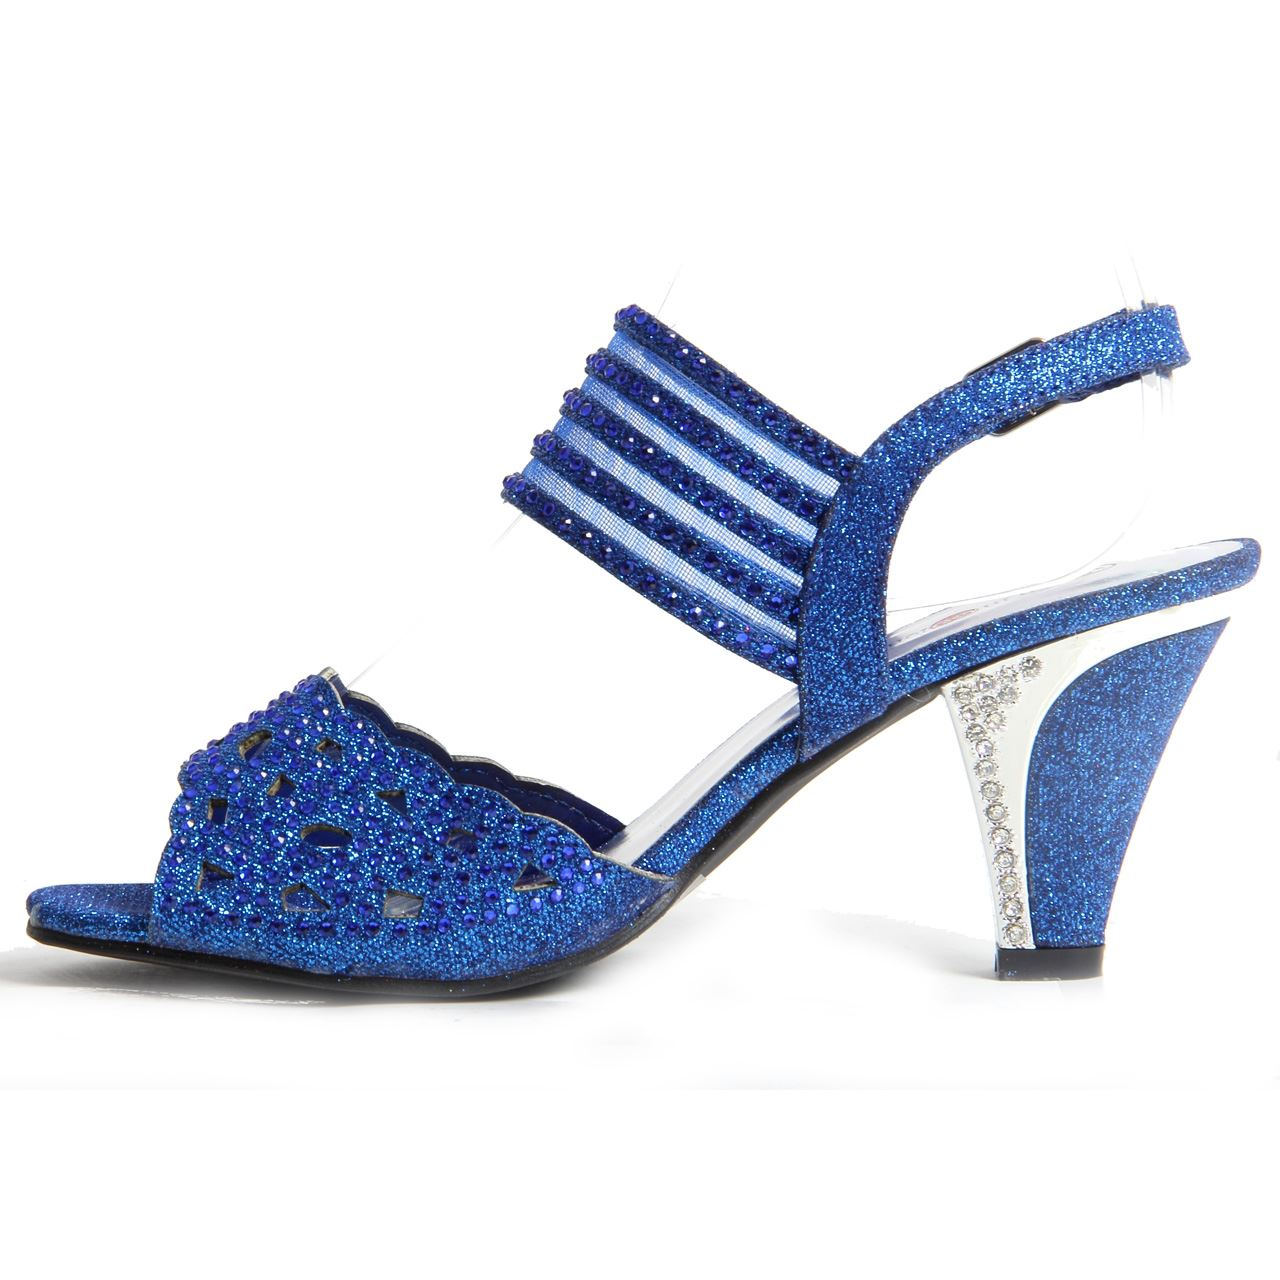 07755b73434 Womens Ladies Sparkling Diamante Block Heel Party Shoes Buckle Up ...